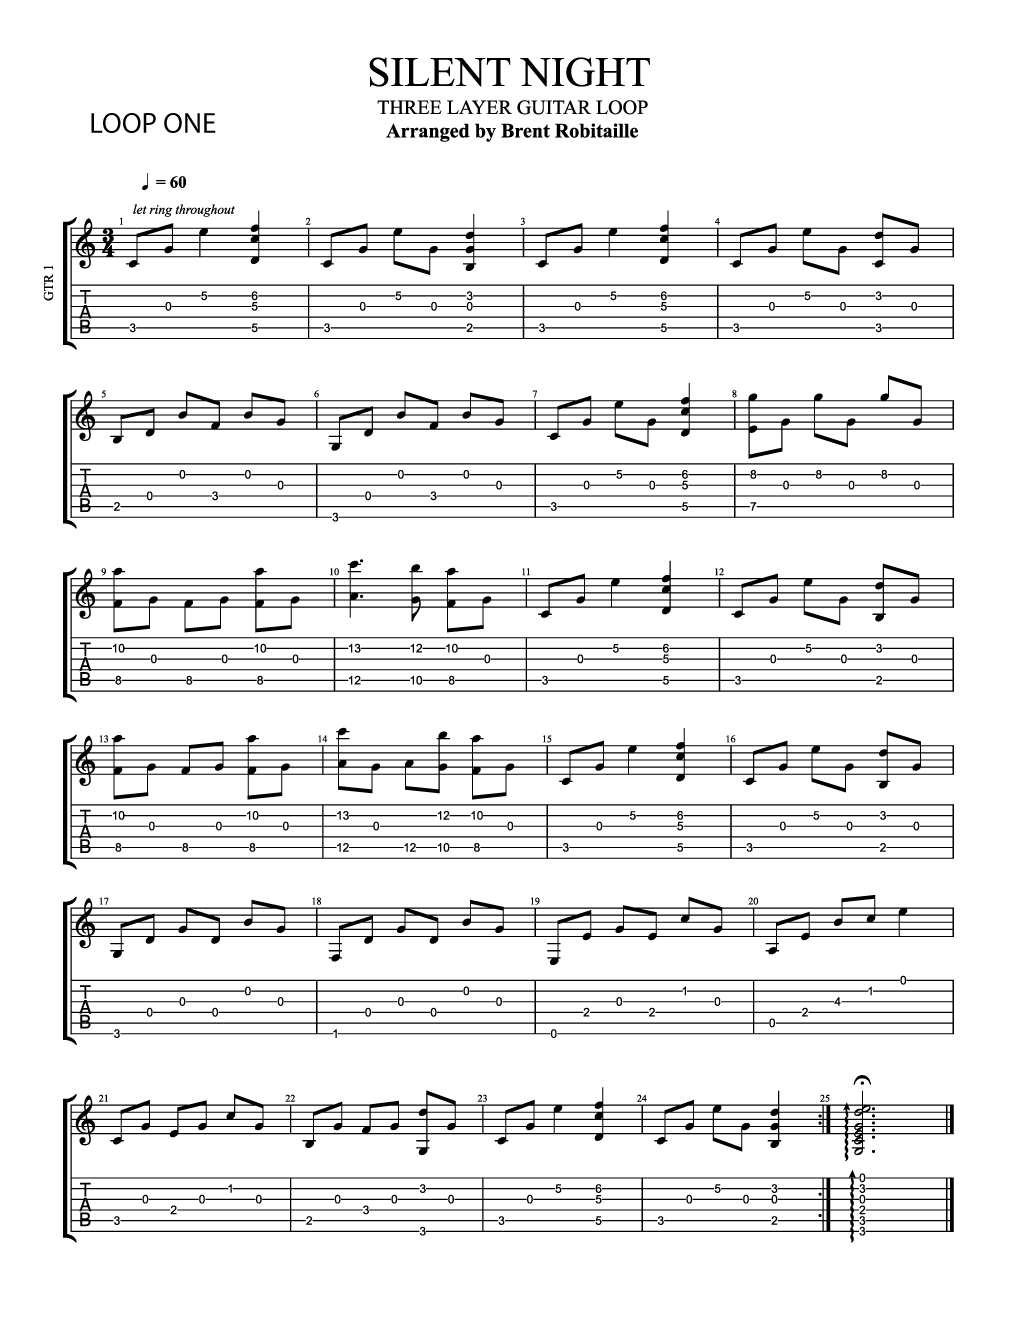 Silent-Night-Guitar-Looper-Pedal-Loop-One